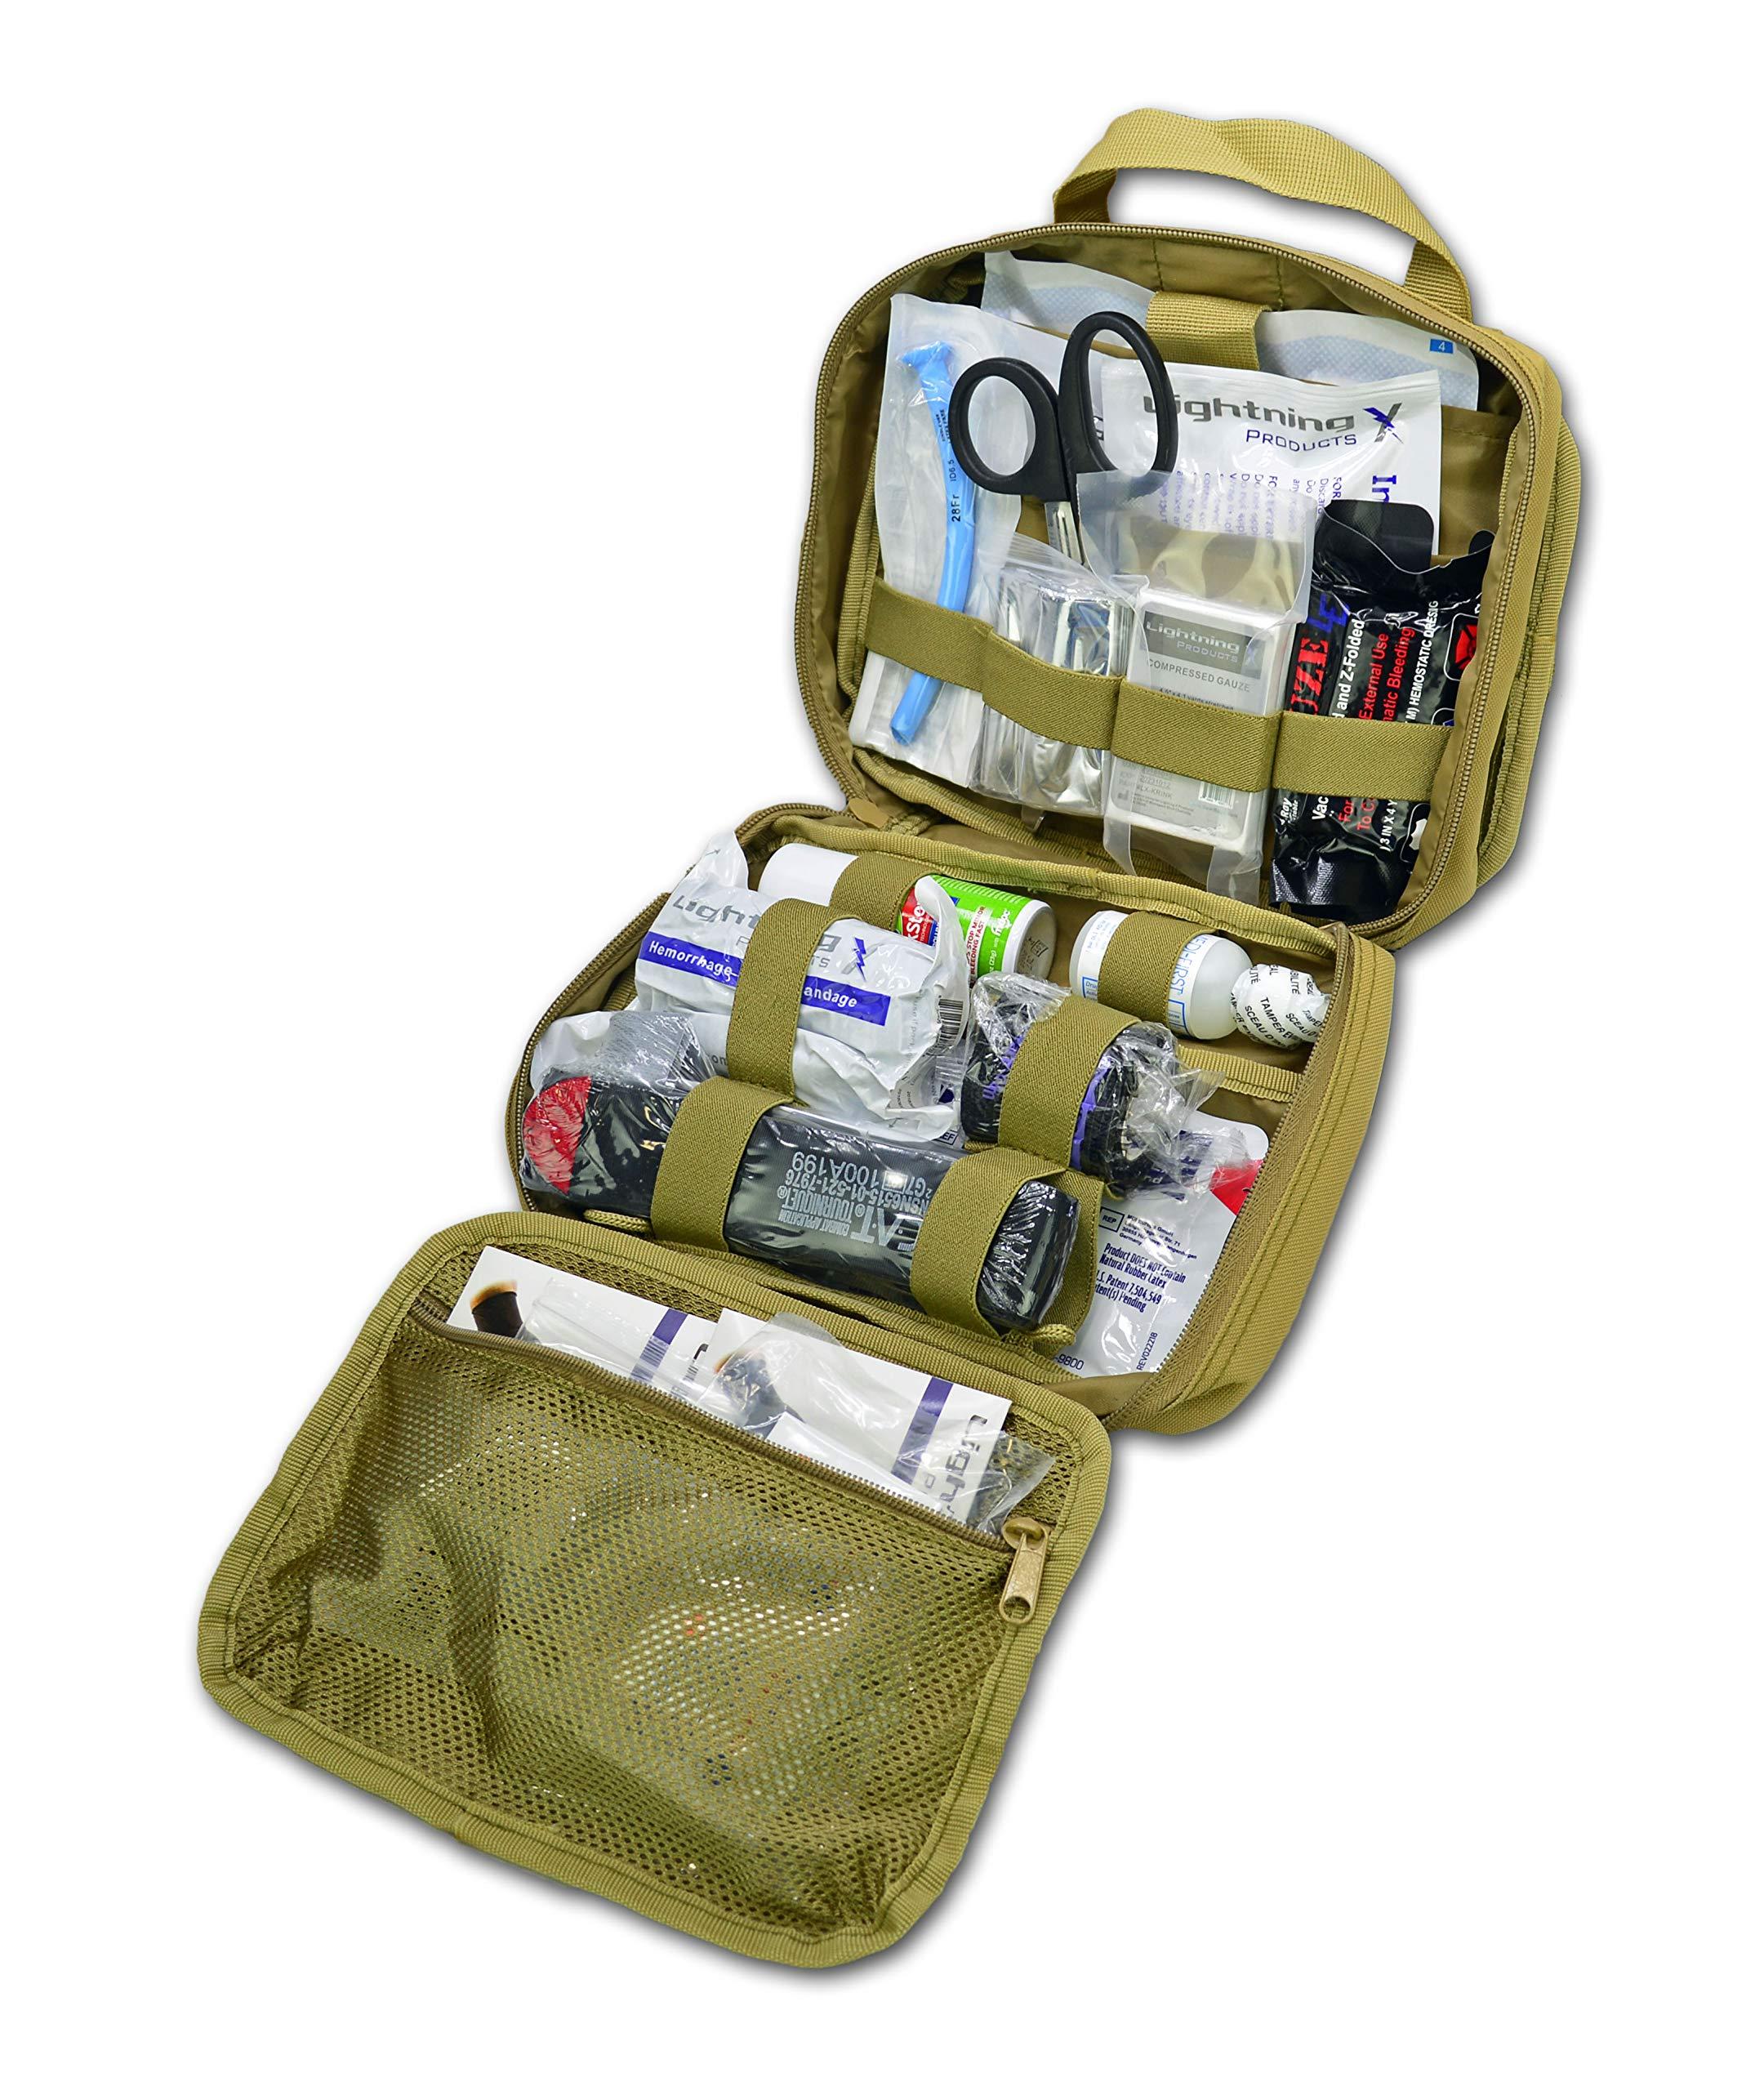 Lightning X Rip-Away Officer's Patrol Tactical Gunshot & Trauma IFAK Kit w/Headrest Mount - TAN by Lightning X Products